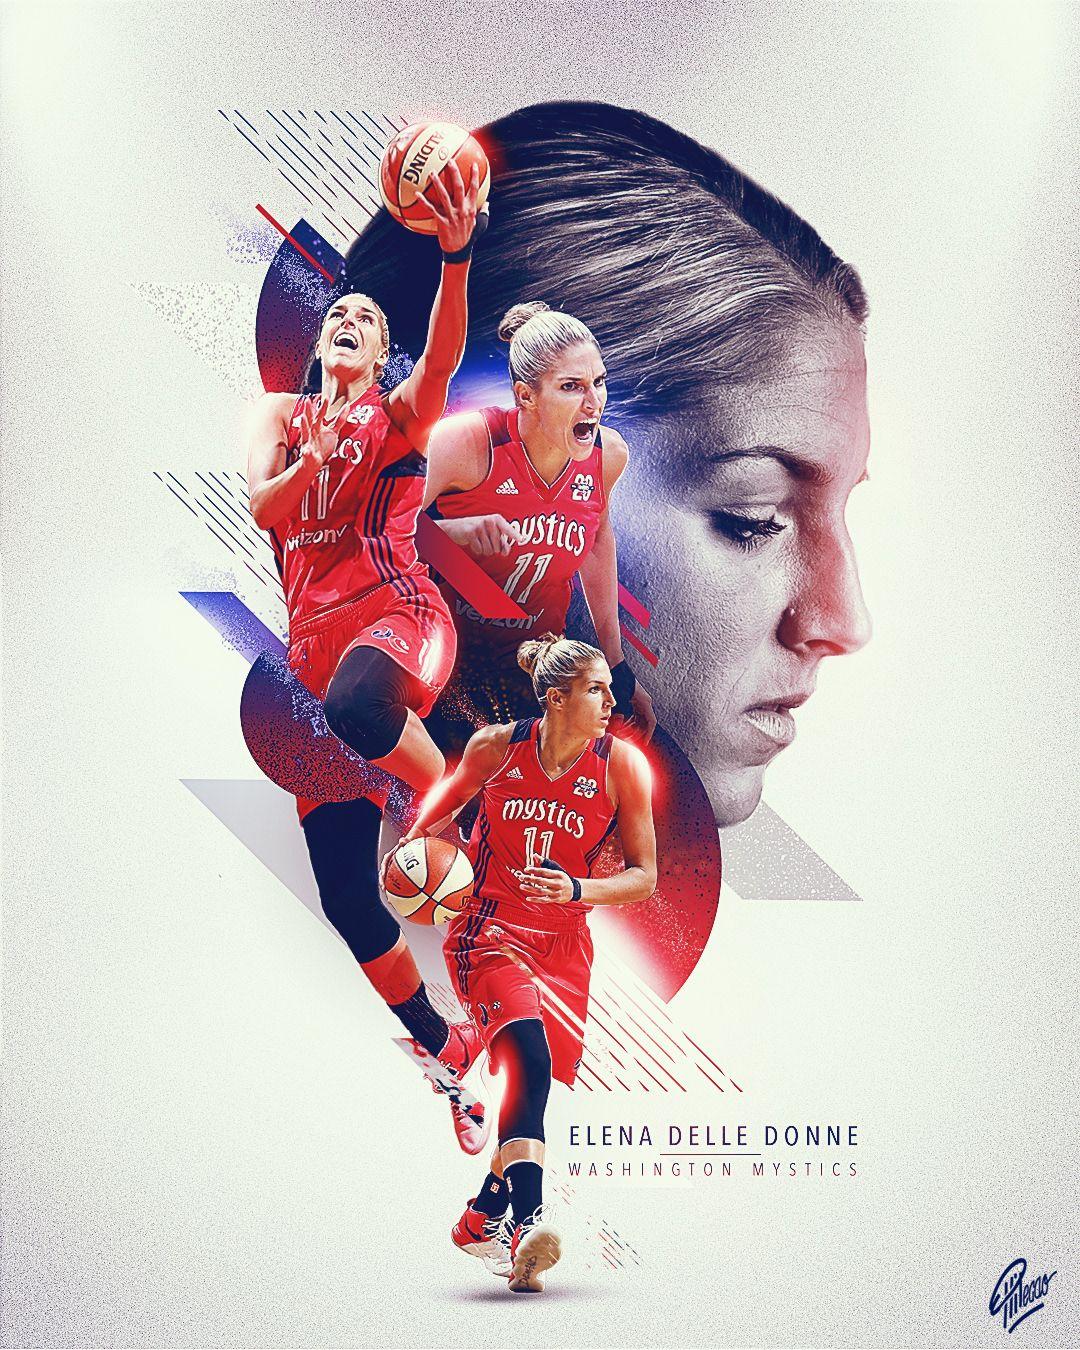 Wnba Collection Vol 1 On Behance Sport Poster Design Sports